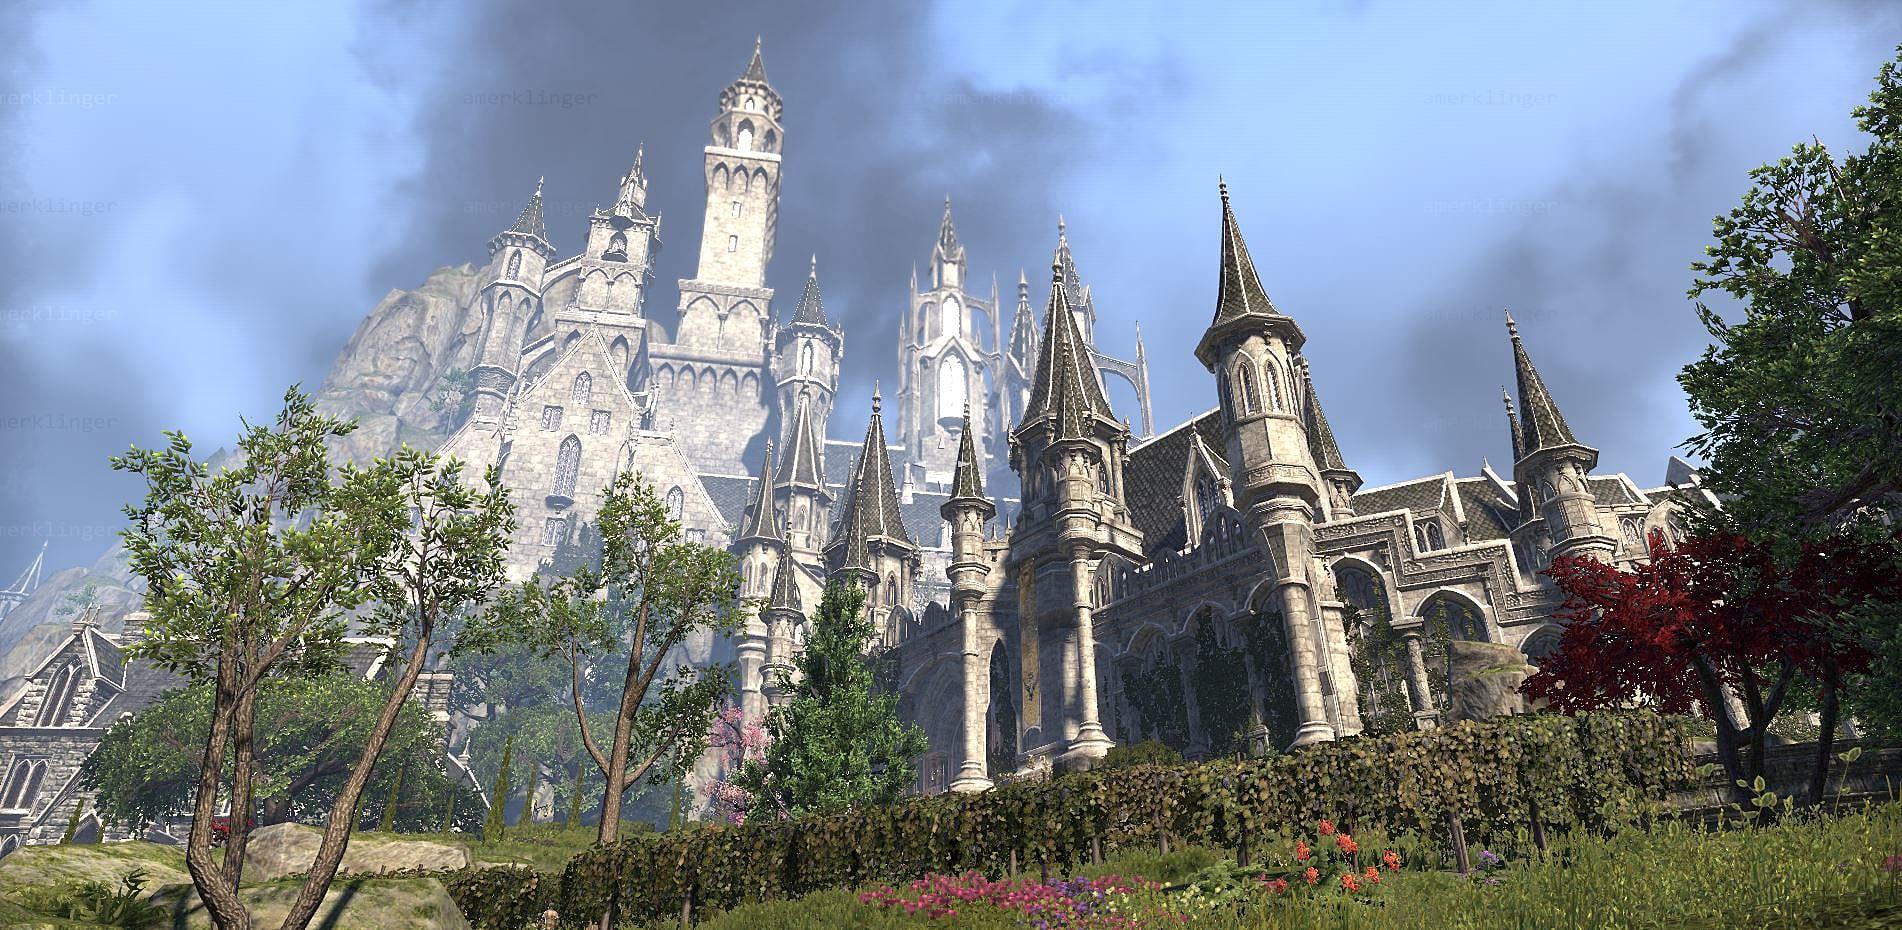 Elder Scrolls Online: Summerset First Look | Elder Scrolls Online